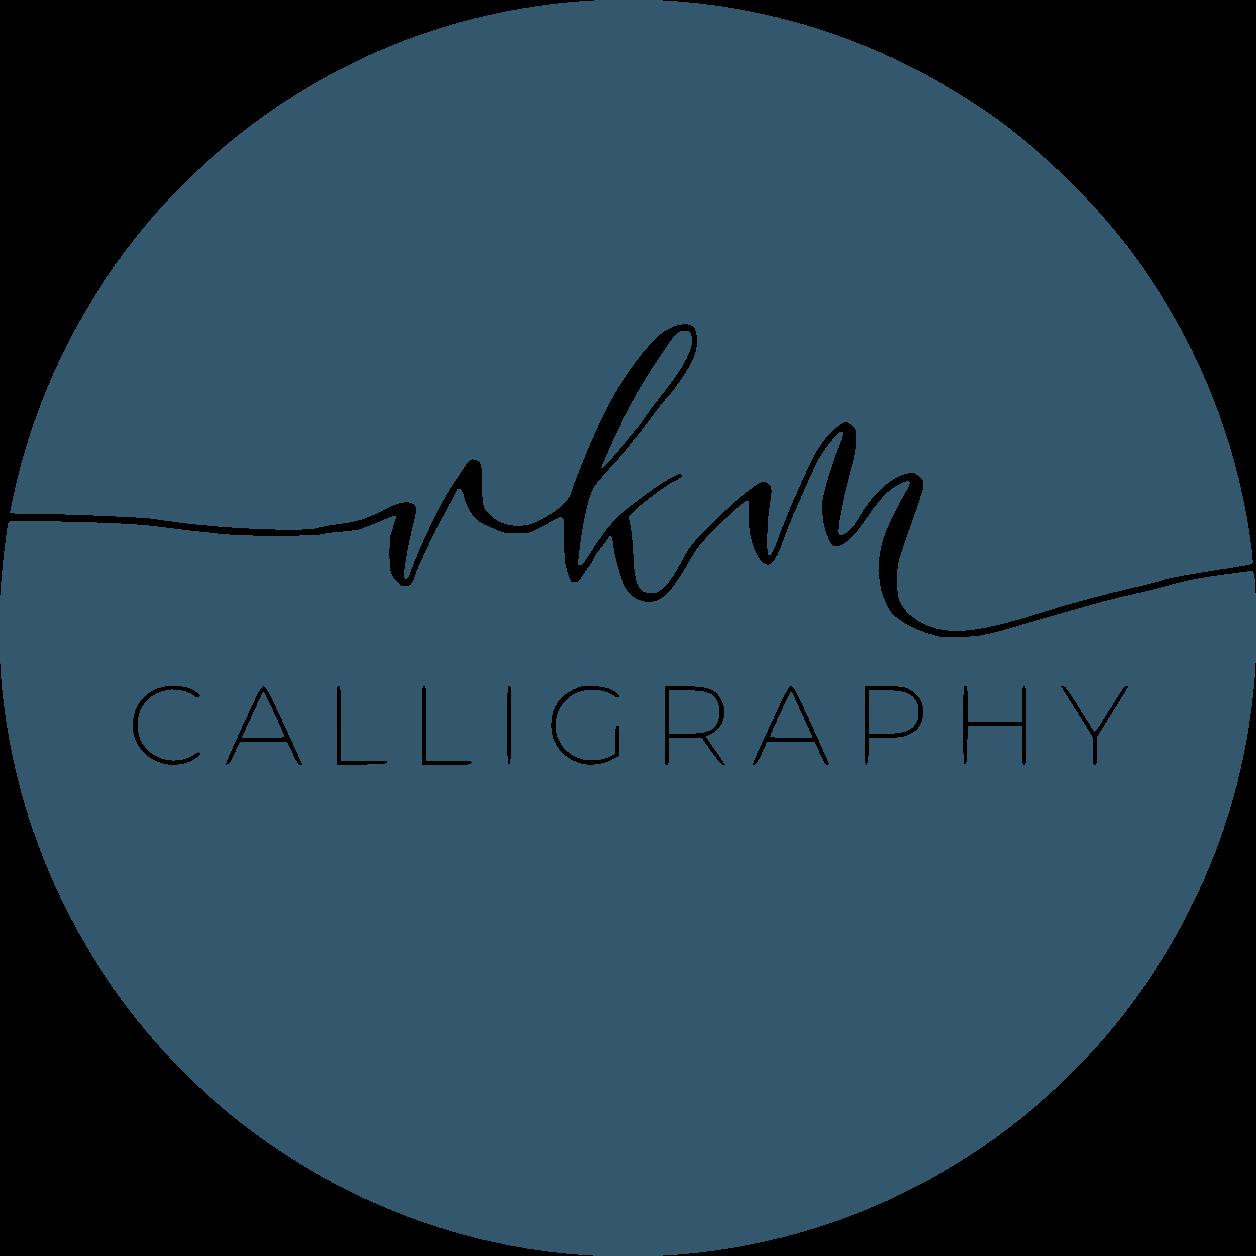 RKM Calligraphy